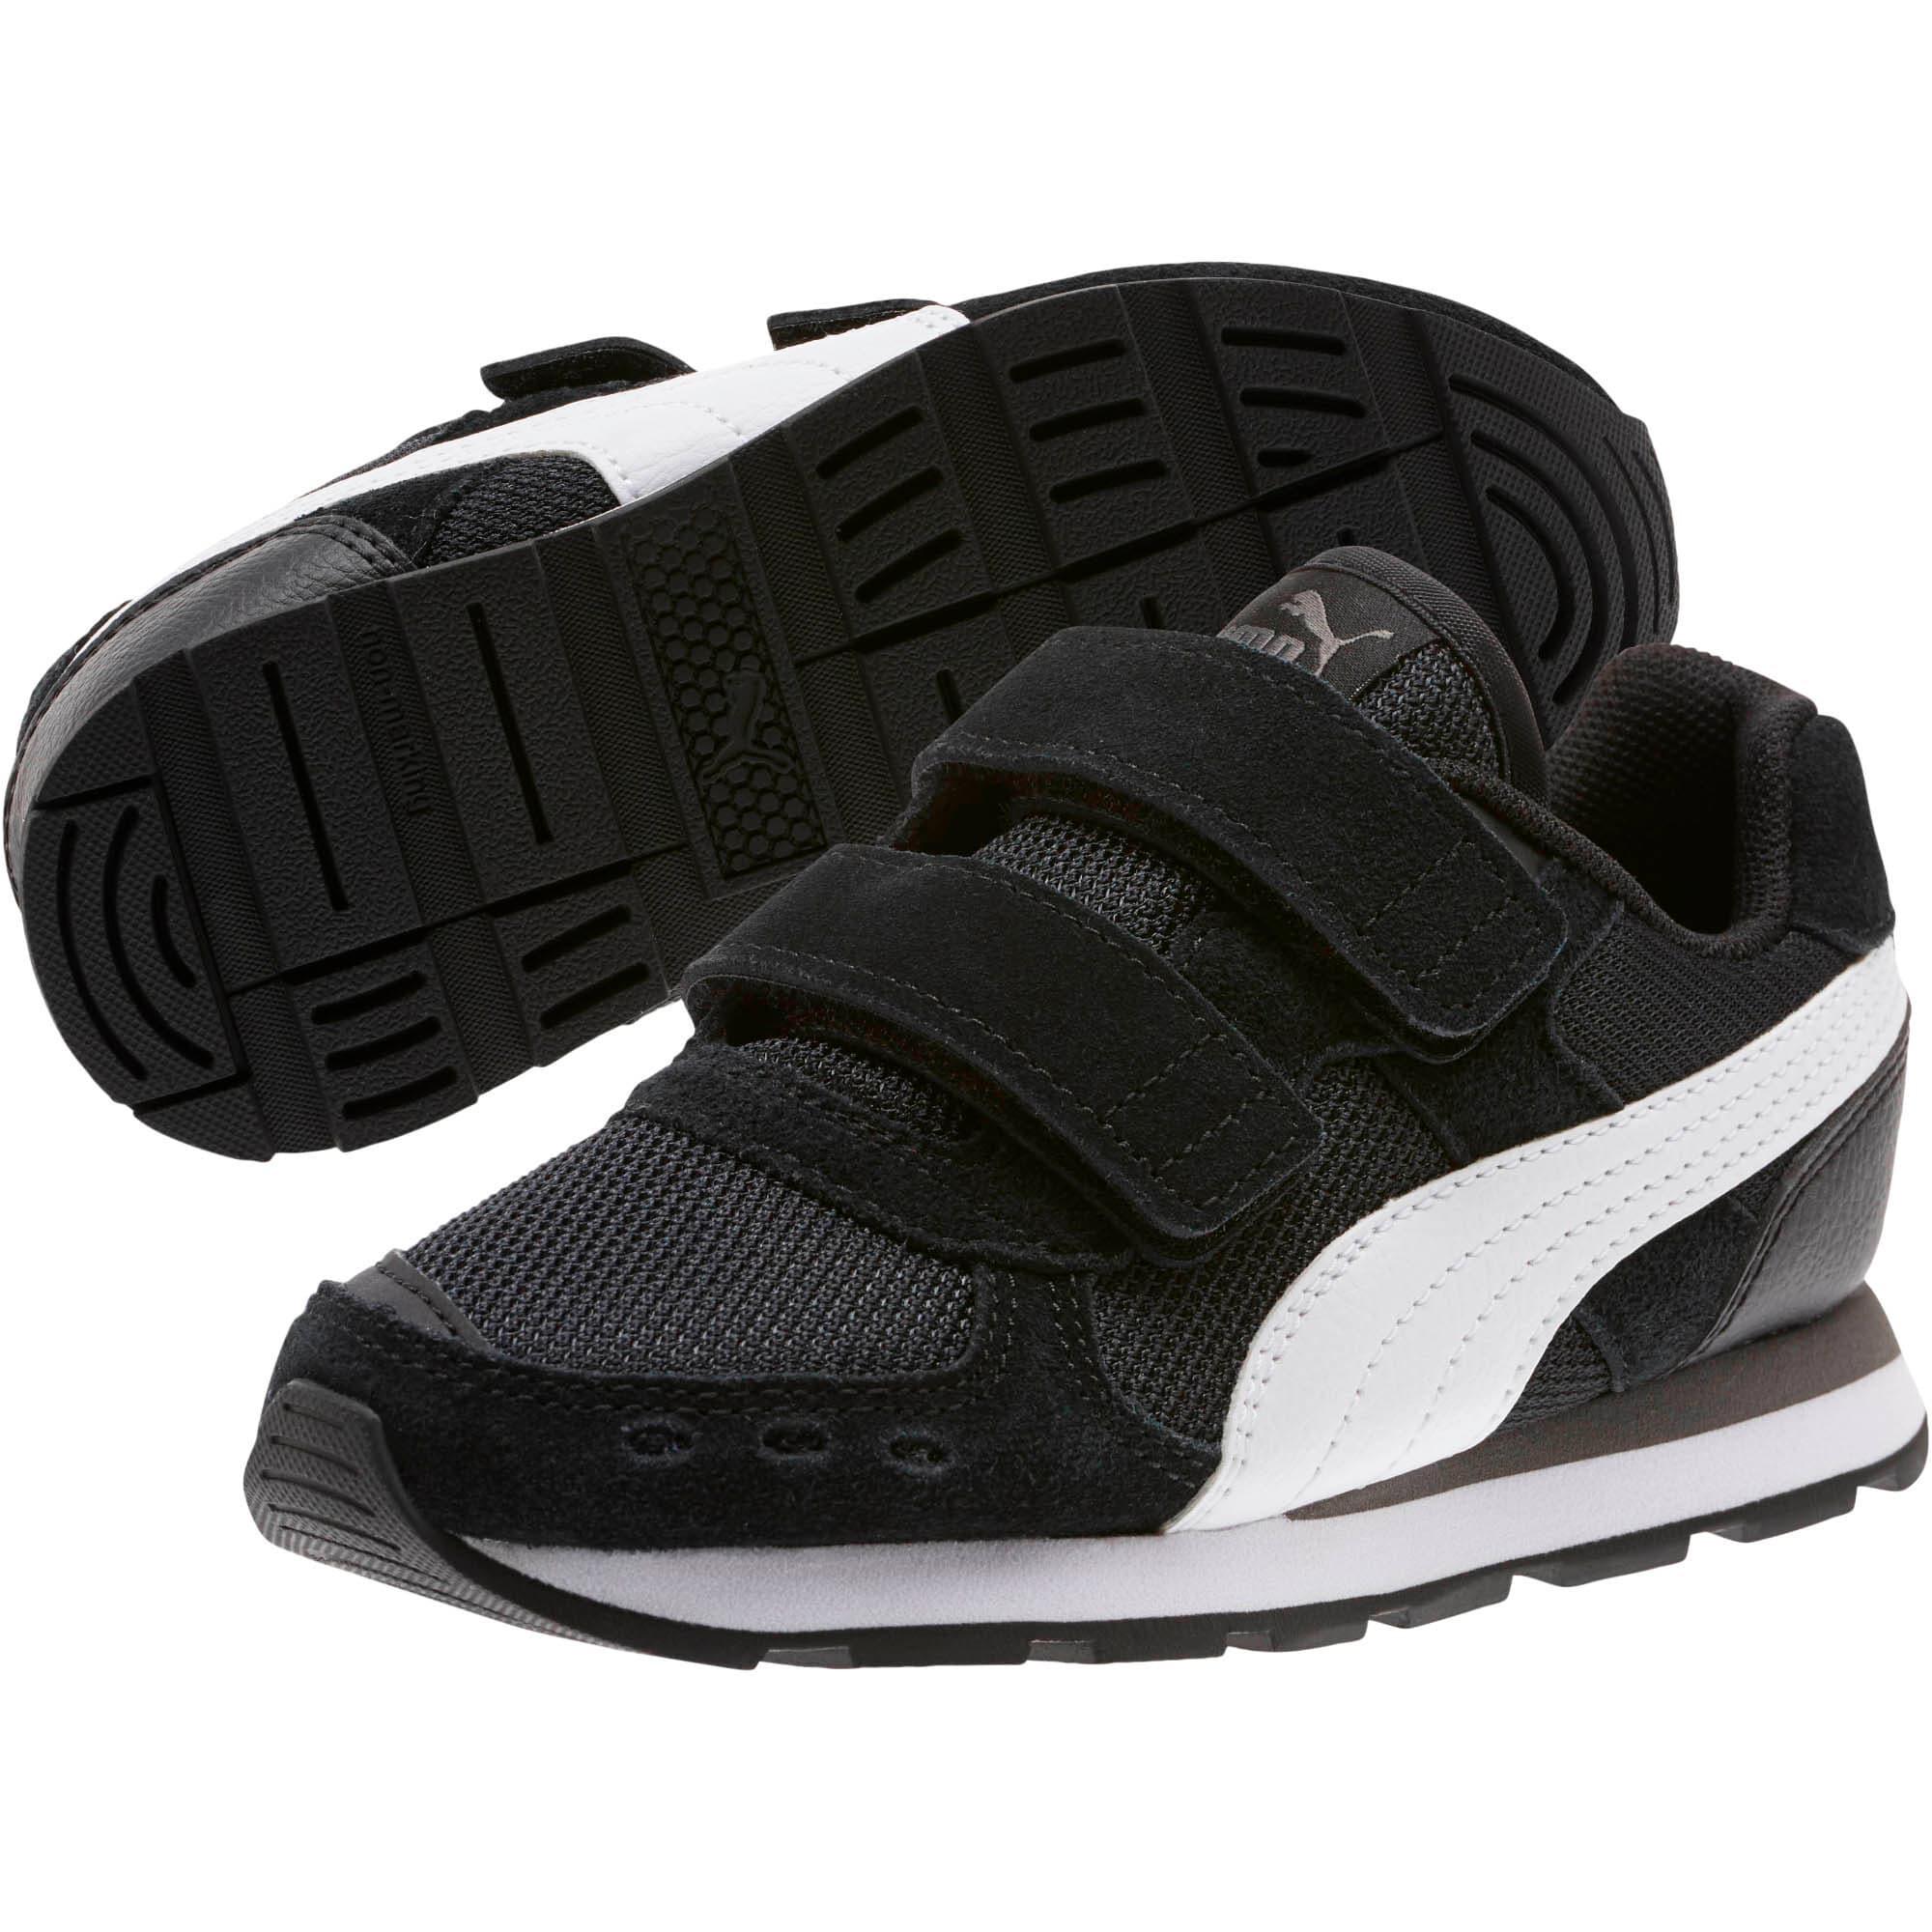 Thumbnail 2 of Vista Little Kids' Shoes, Puma Black-Puma White, medium